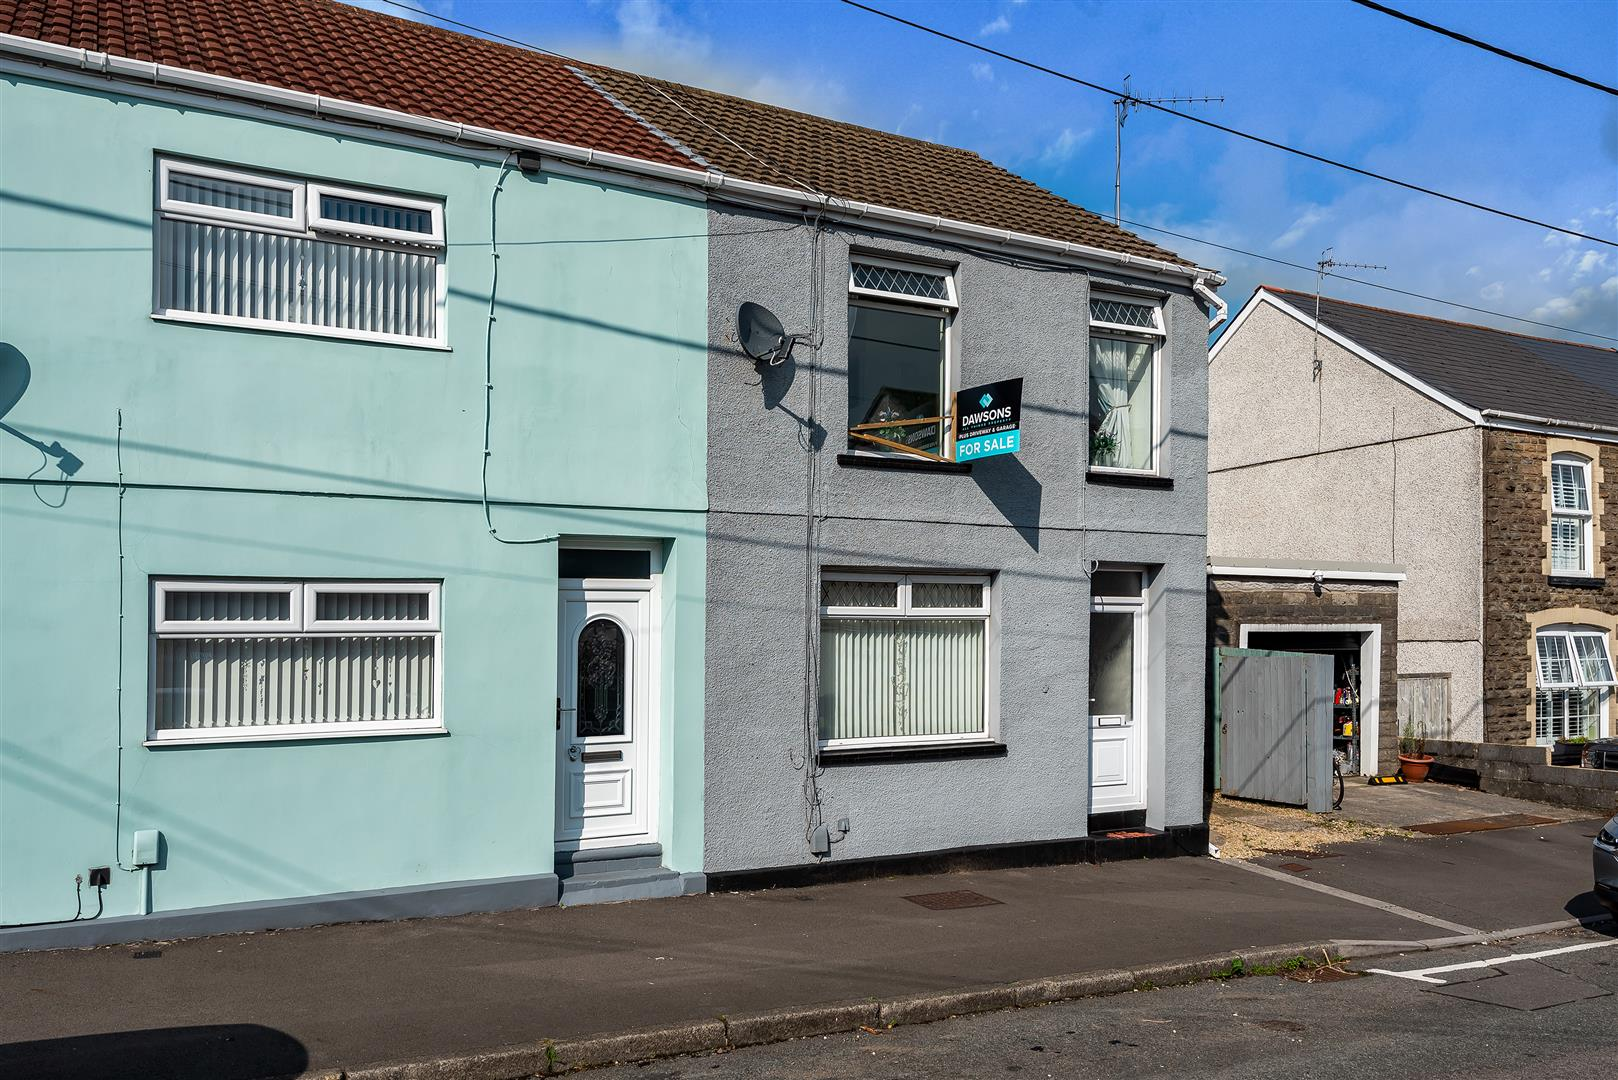 Libanus Road, Gorseinon, Swansea, SA4 4AN